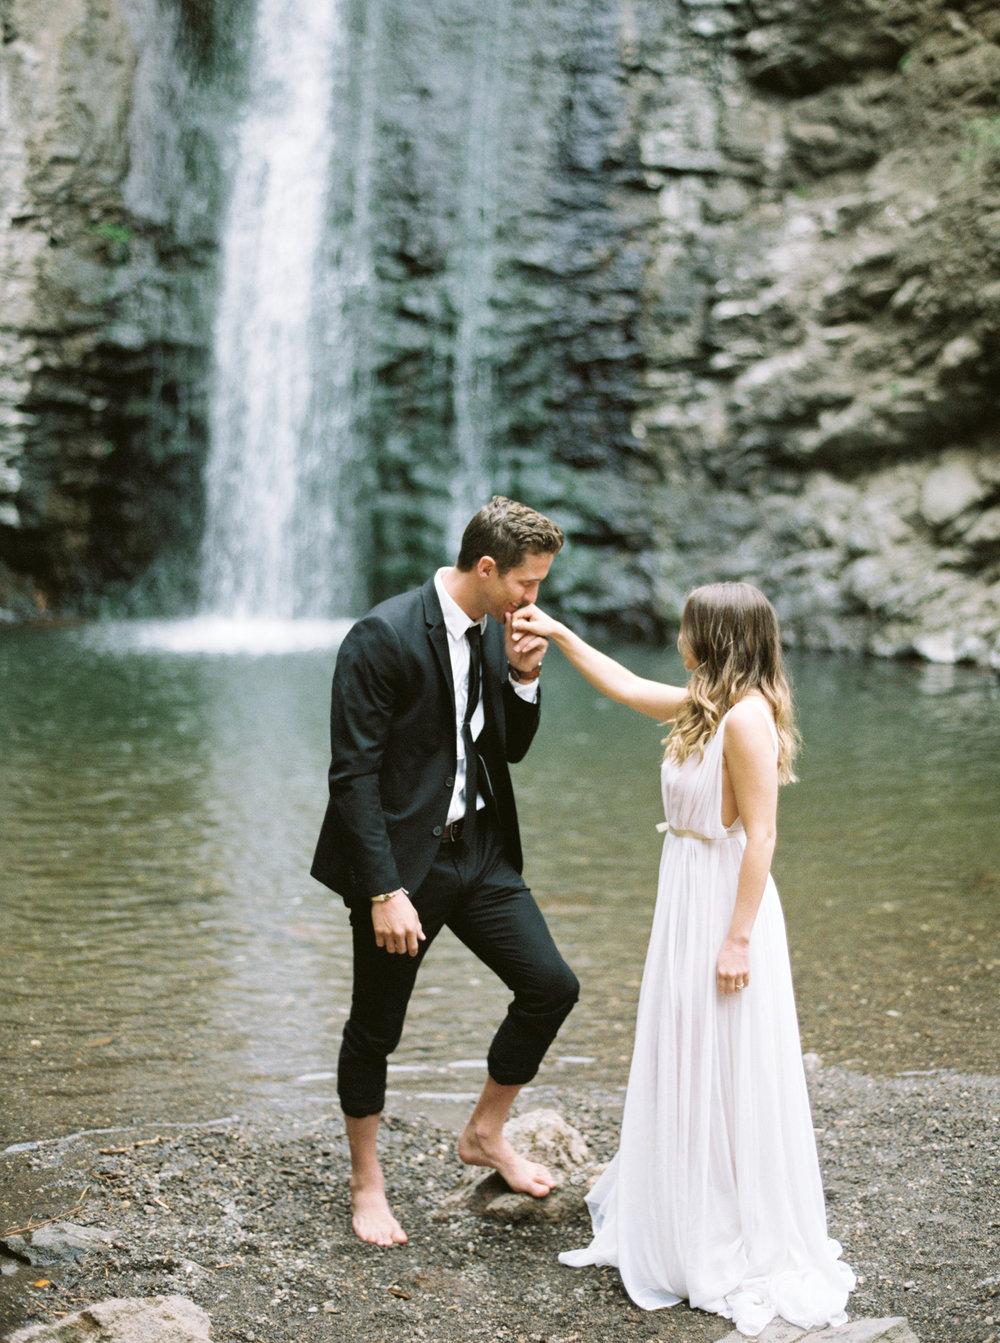 Romantic Wedding Photographer Boise